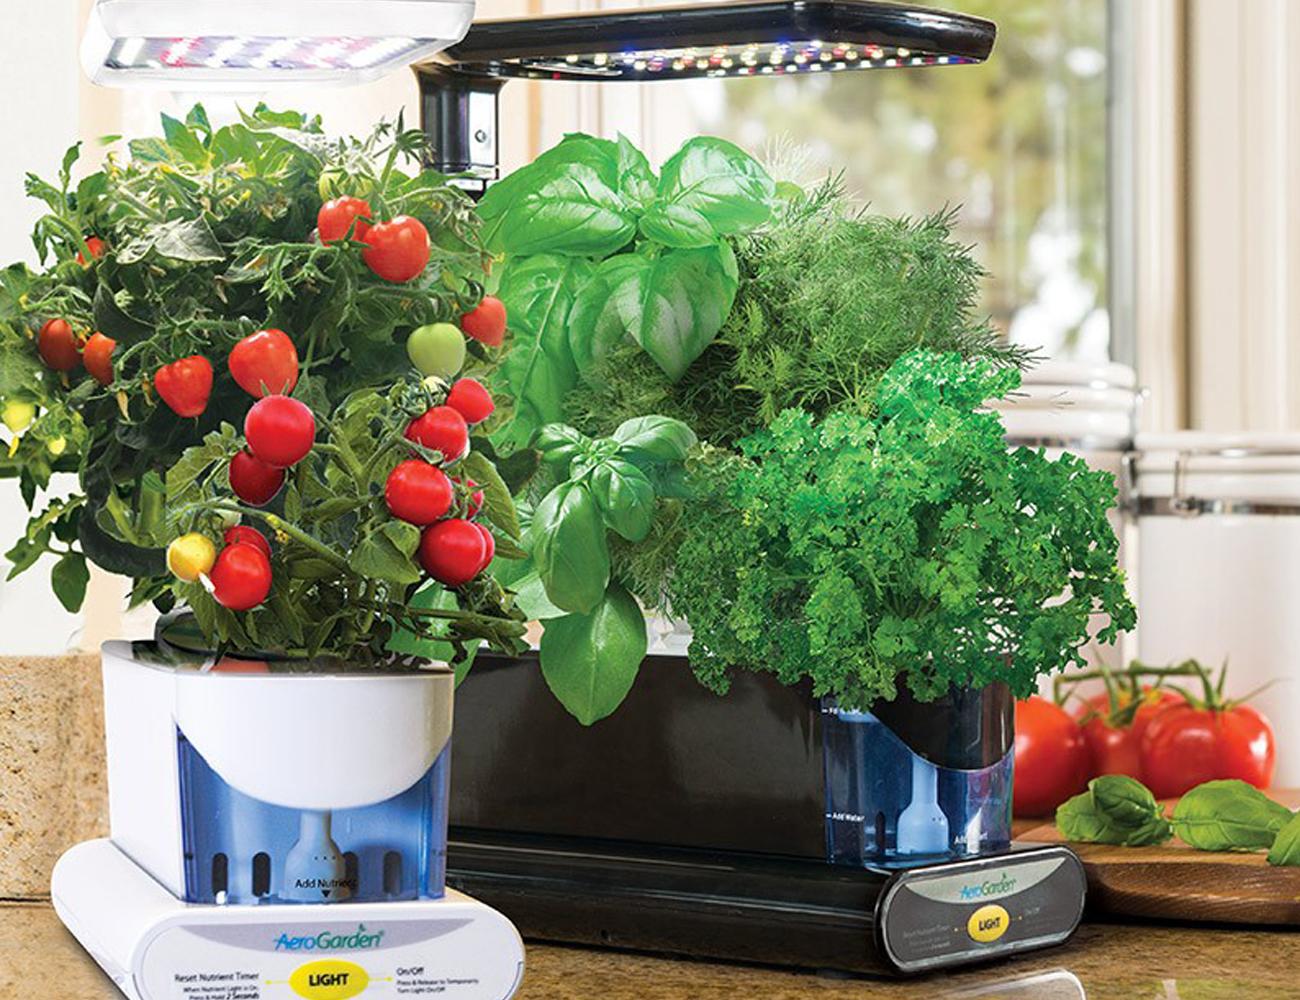 Miracle-Gro AeroGarden with Gourmet Herb Seeds